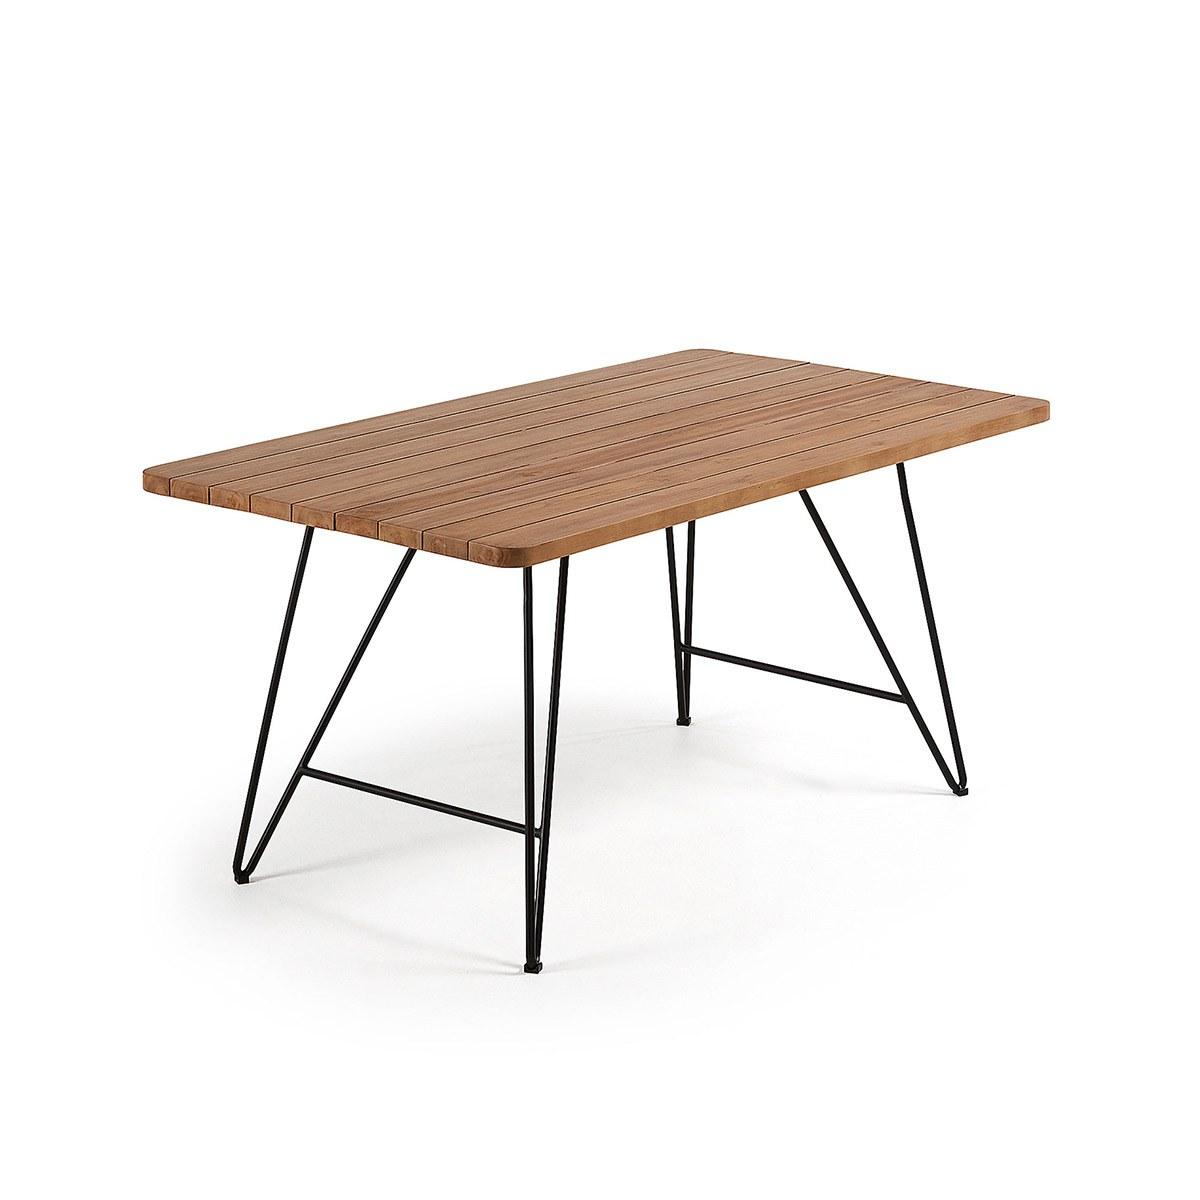 Mesa comedor madera maciza - Artikalia - Mesas de comedor